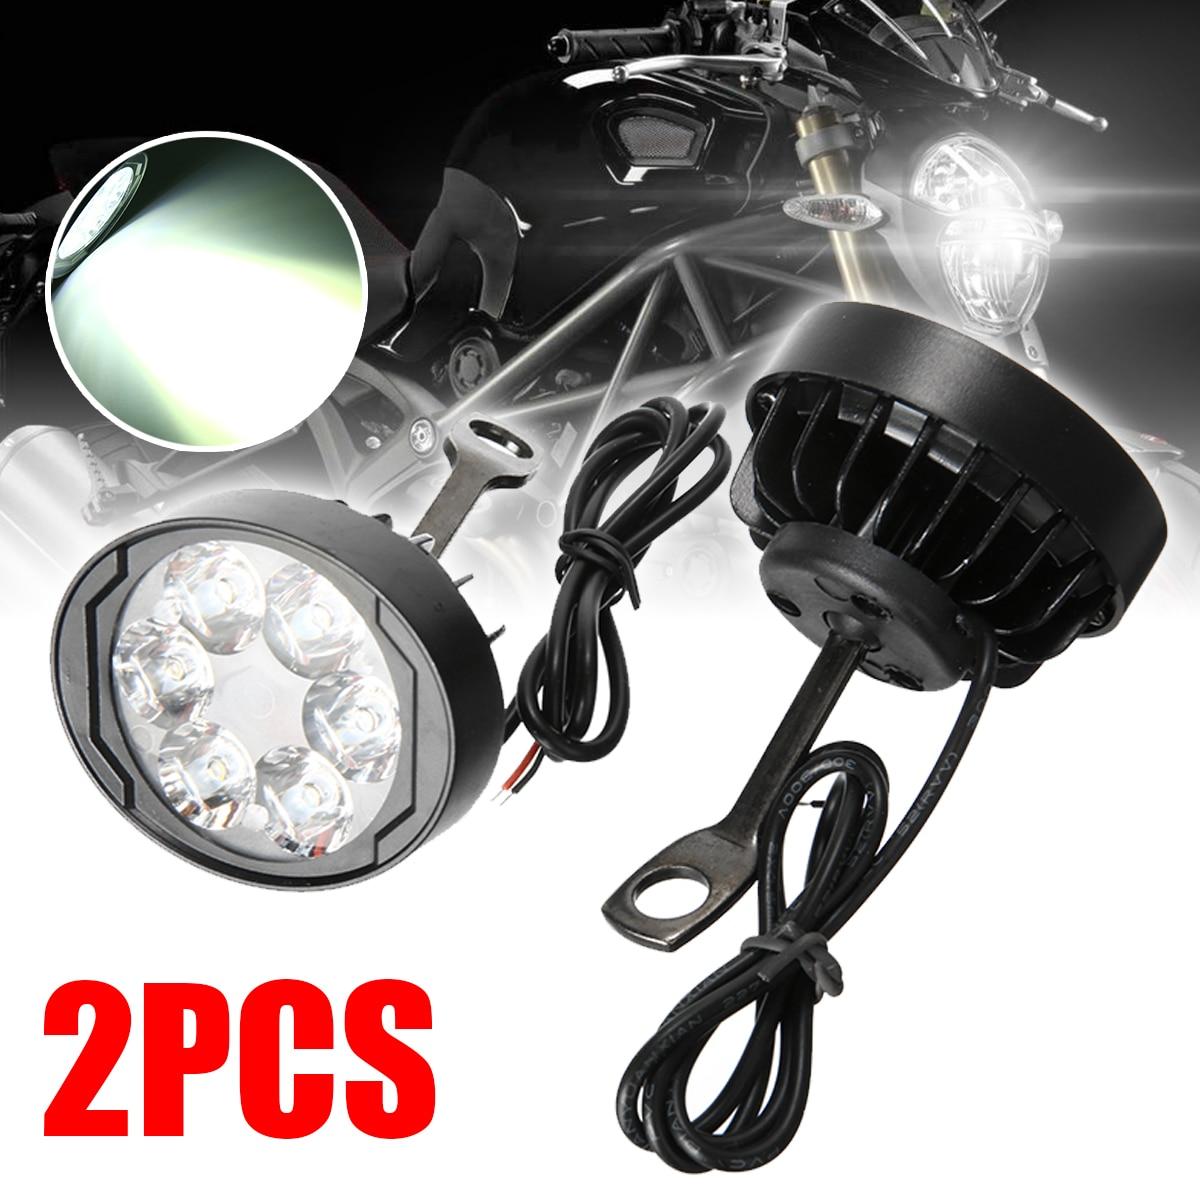 Mayitr 2pcs Universal Motorcycle E-bike 12-85V 6LED Headlight Headlamp Fog Spot Light Waterproof Lamp Bulb Scooter Accessories